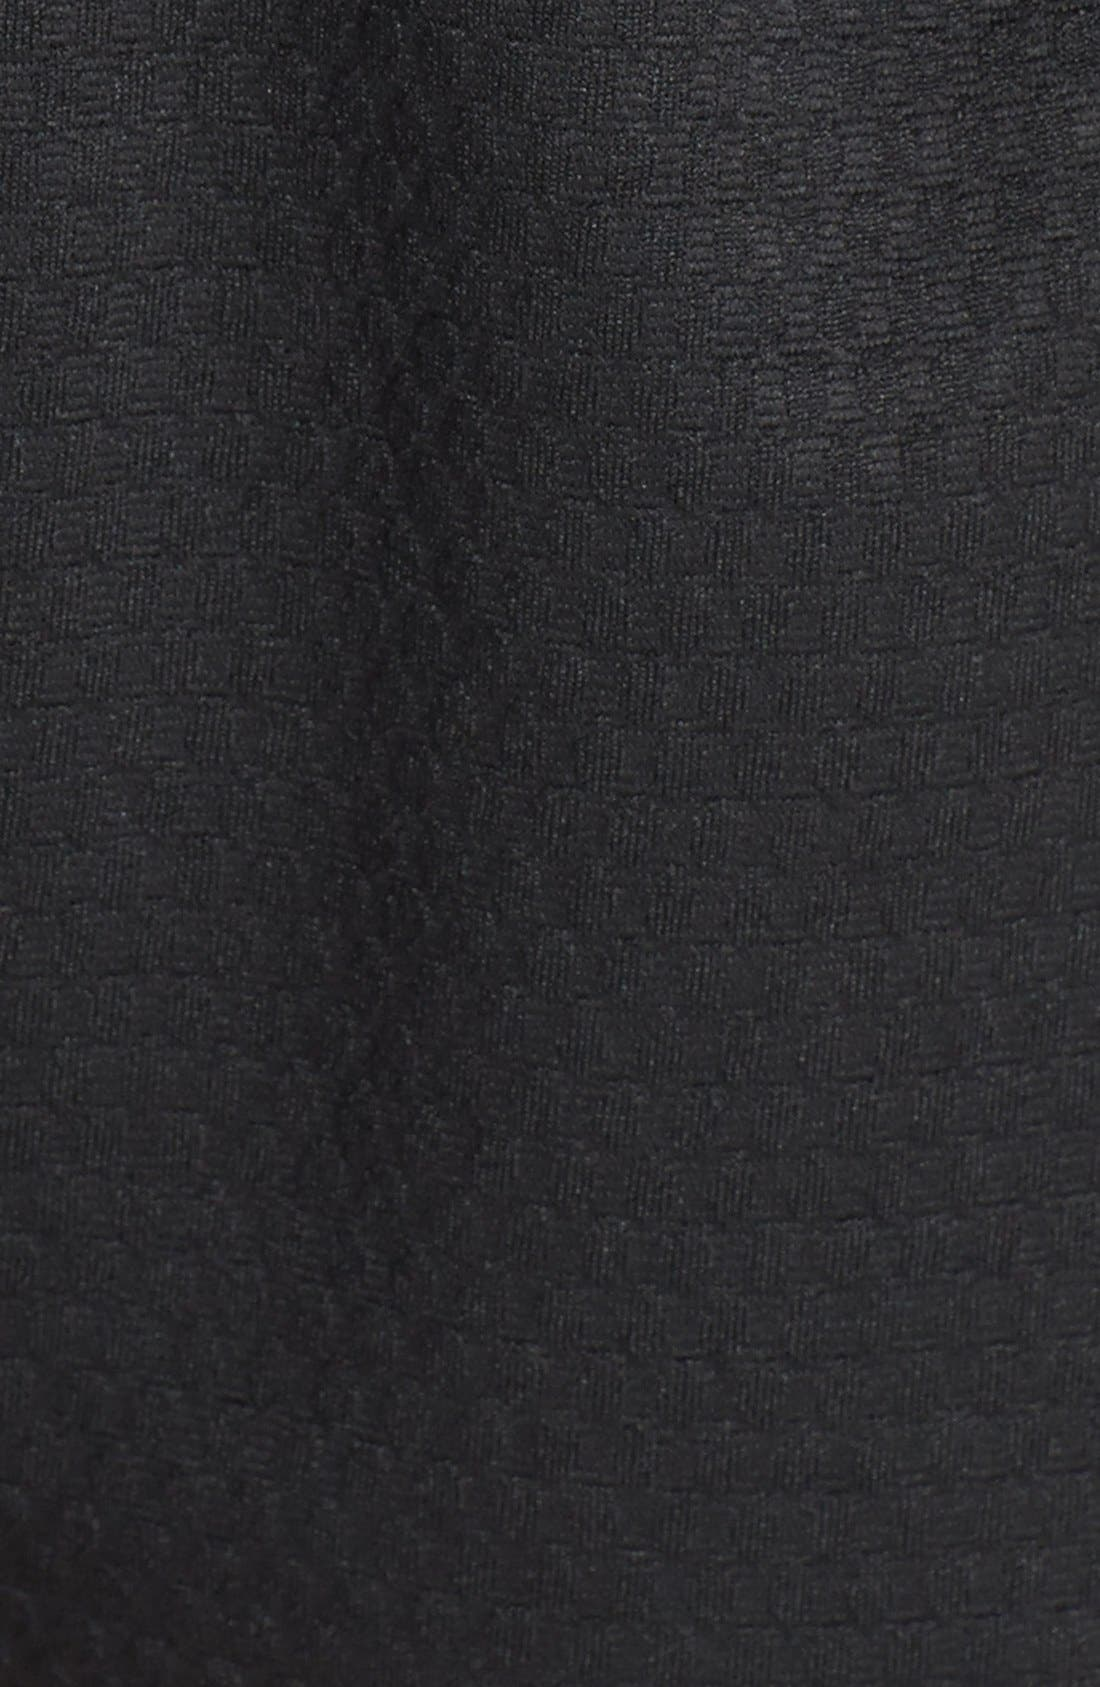 Alternate Image 3  - June & Hudson Strap Detail Textured Romper